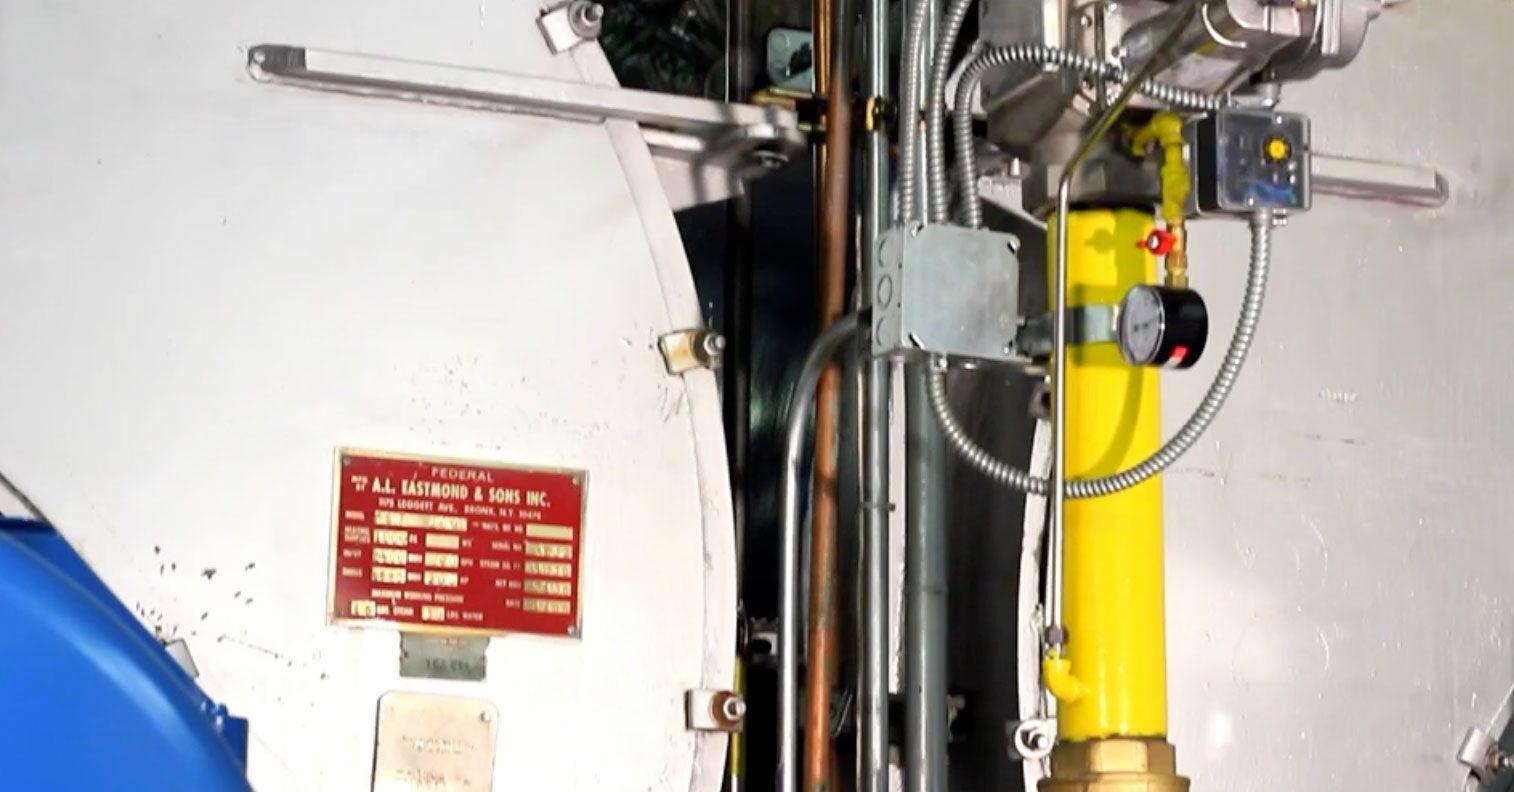 Boiler Inspection Checklist, ASHRAE 180 2012